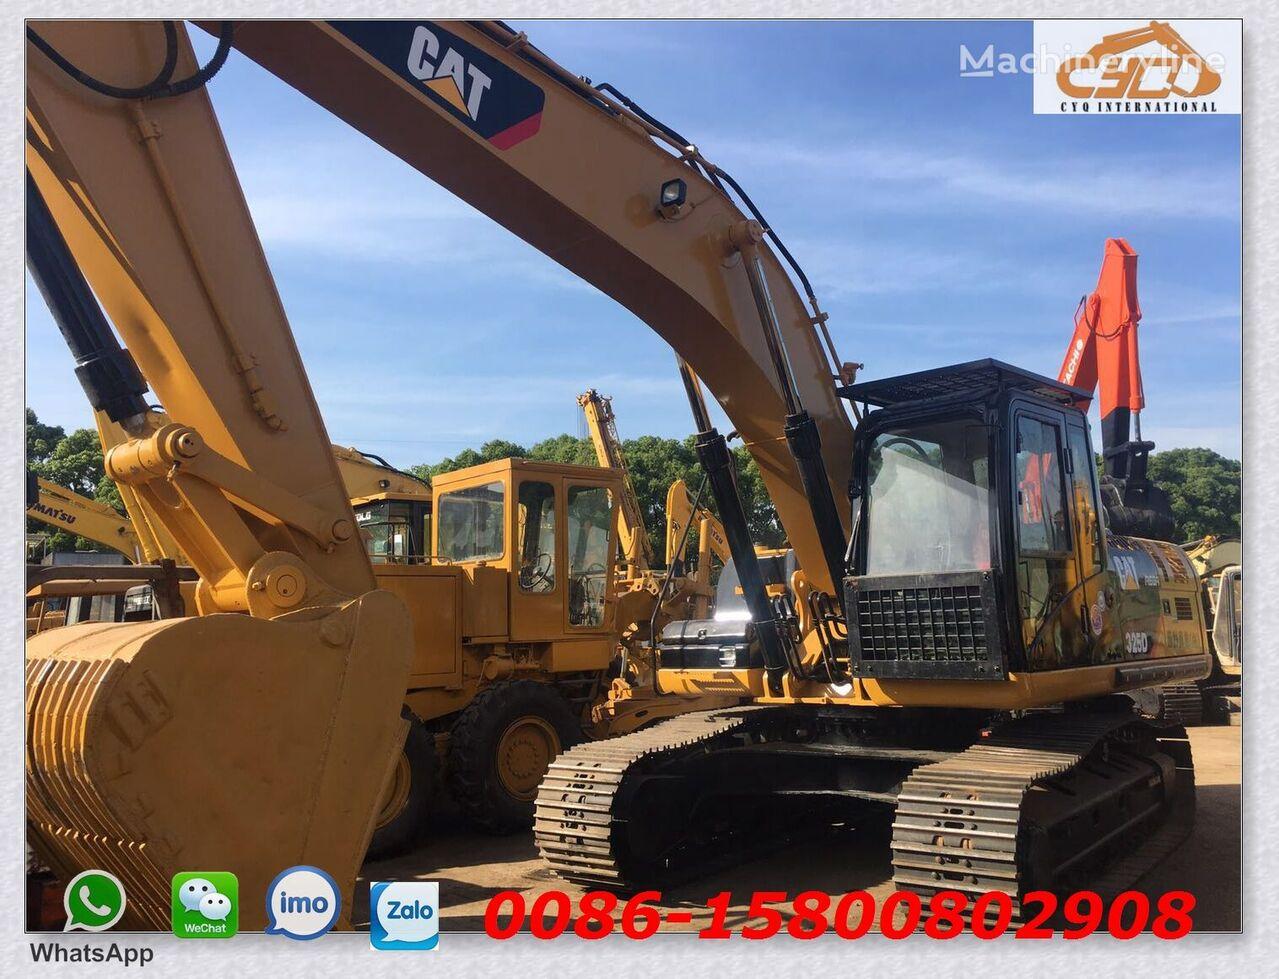 CATERPILLAR 325DL tracked excavator